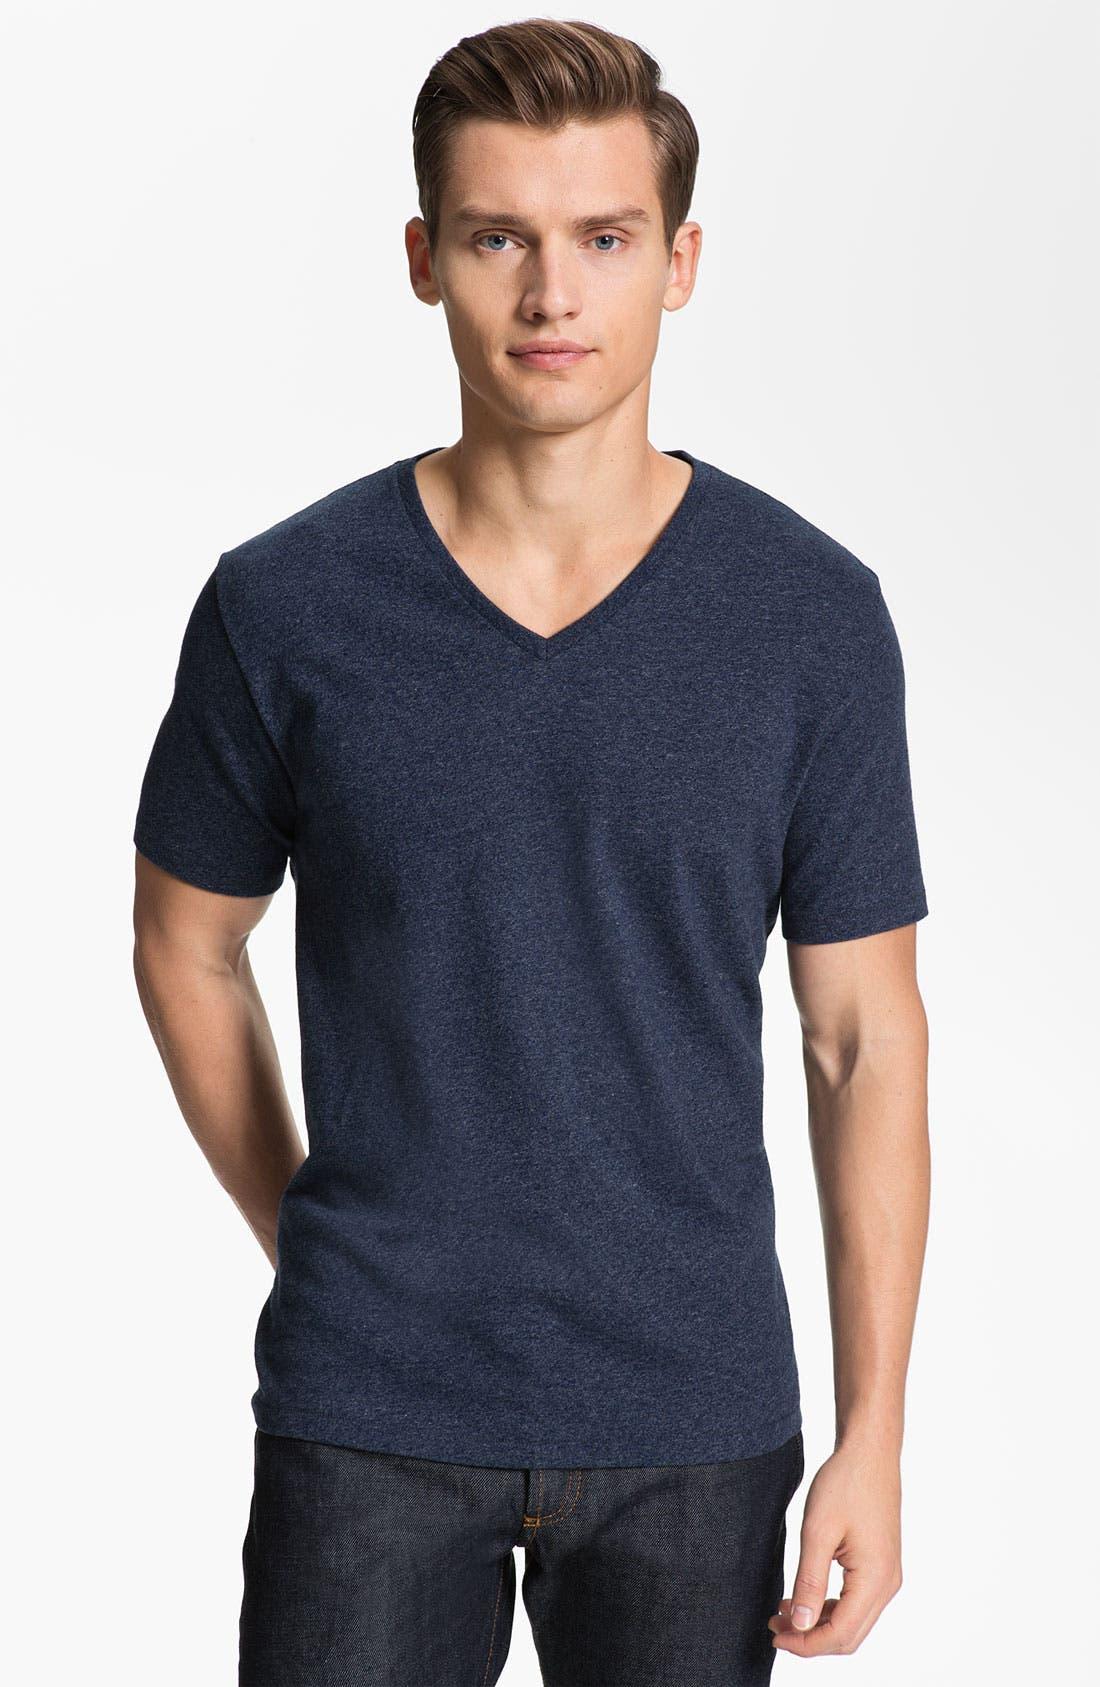 Alternate Image 1 Selected - Jack Spade 'Stark' V-Neck T-Shirt